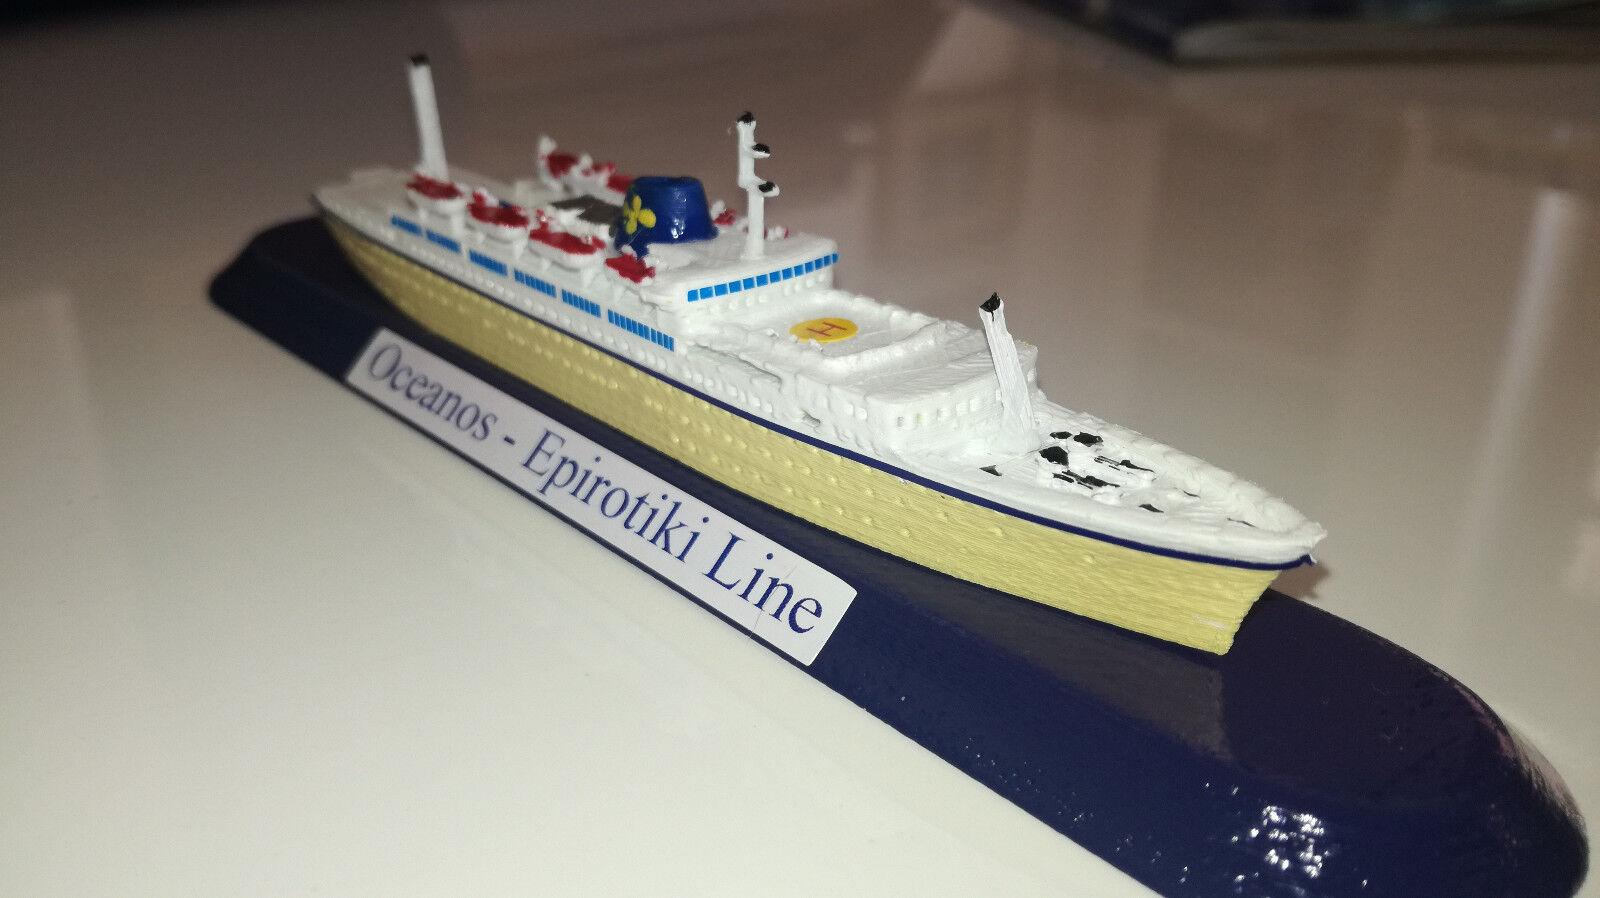 EPIrougeIKI LINE Grecia model m v v v Oceanos scala 1 1250 GreeK Ship  Flotta Lauro 96559b